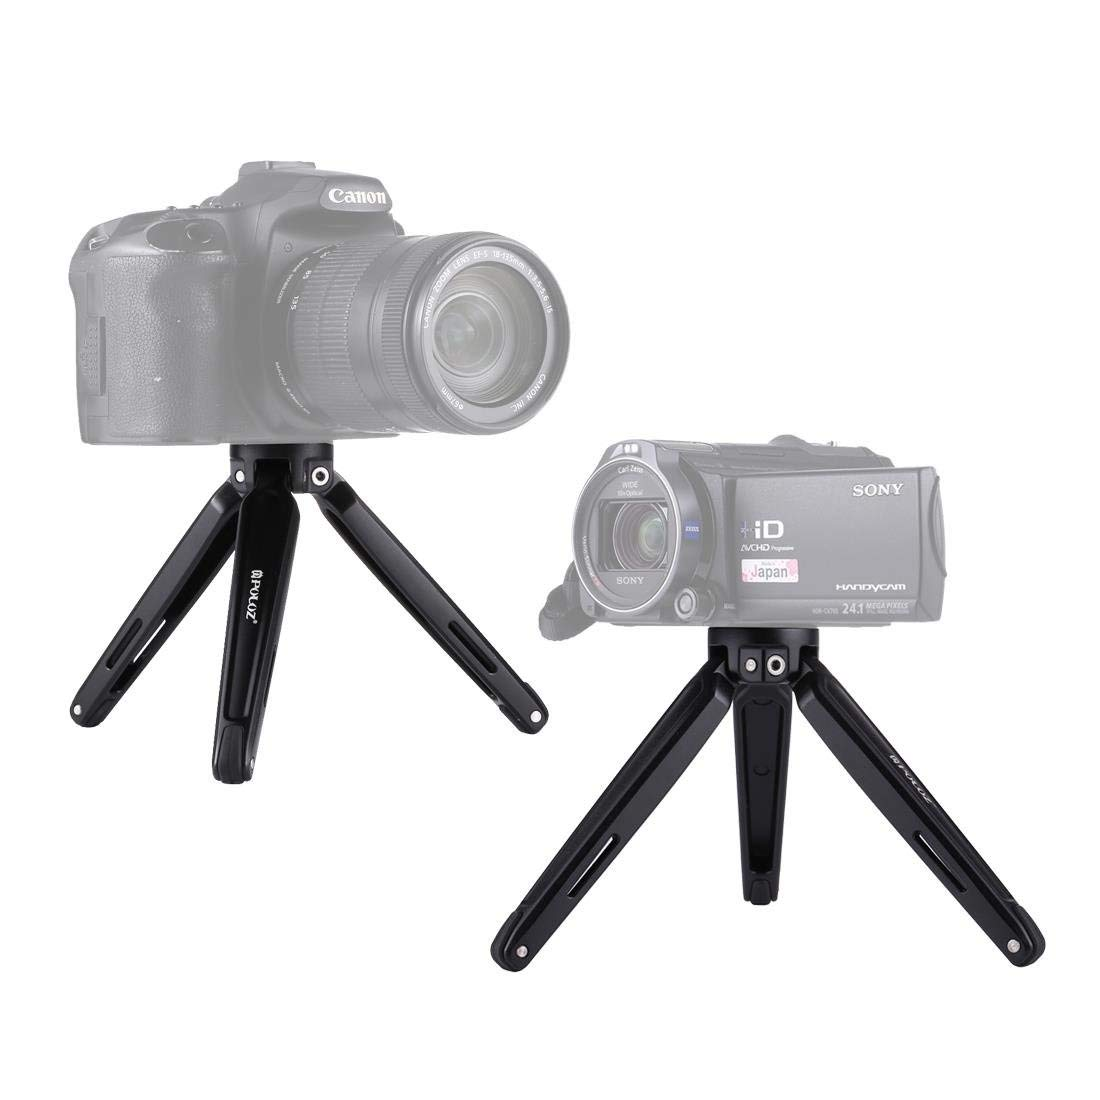 HITSAN PULUZ PU3014B Pocket Mini Metal Desktop Tripod Mount for DSLR Camera 4.5-15cm Max Load 20kg One Piece